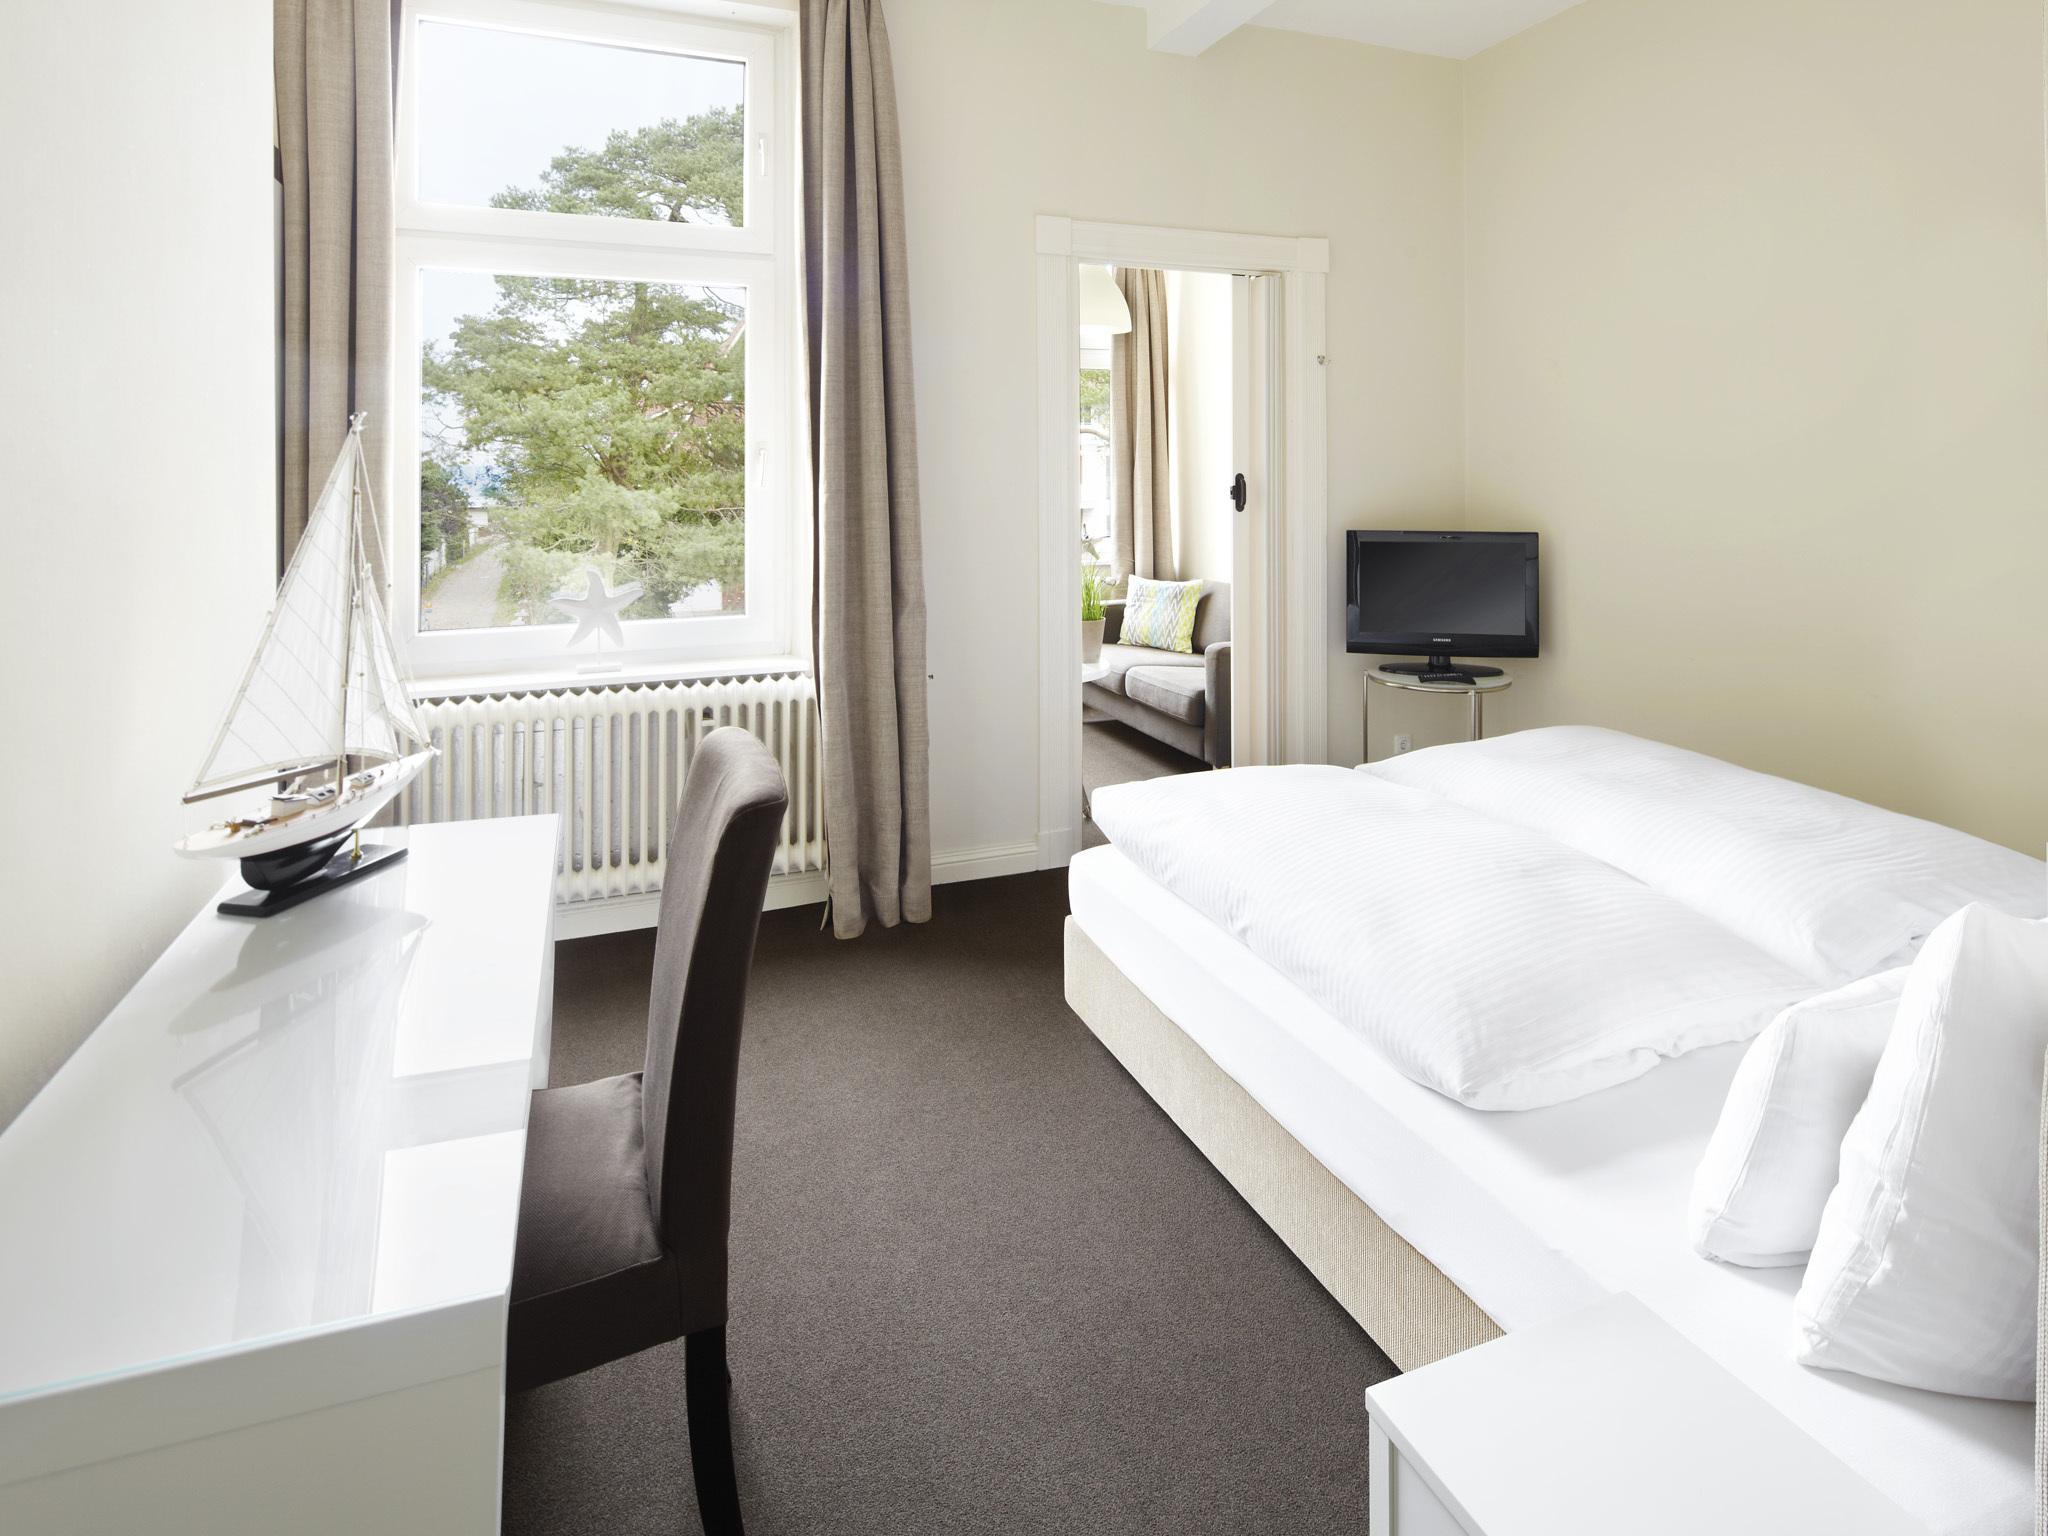 Doppelzimmer-Komfort-Eigenes Badezimmer - Doppelzimmer-Komfort-Eigenes Badezimmer